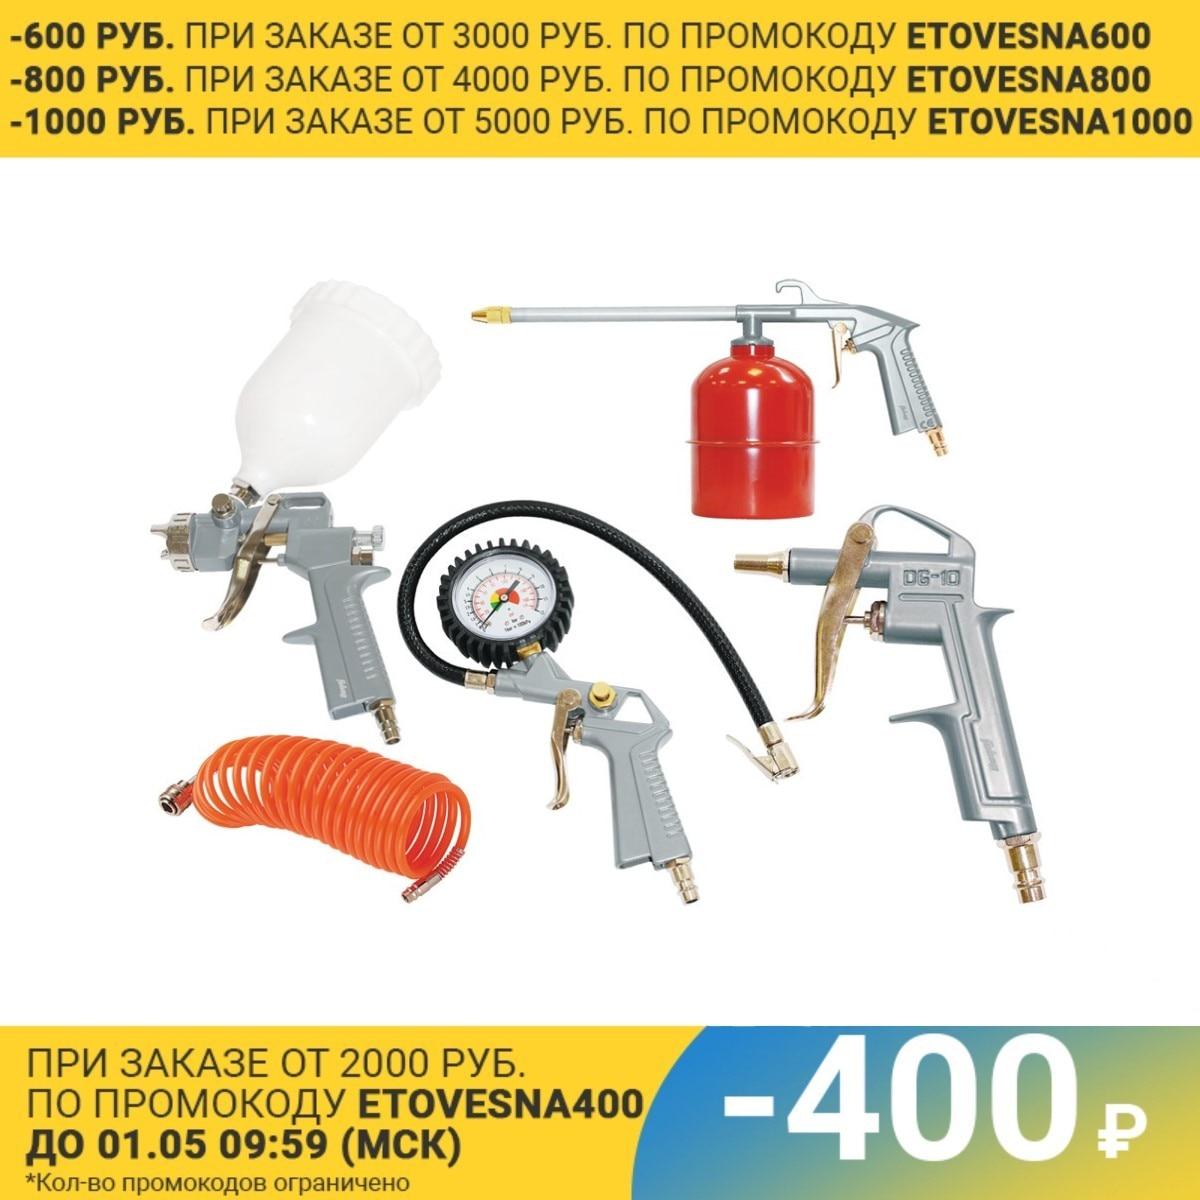 Набор пневмоинструмента для компрессора 5 предметов(продувка, подкачка, мовильница, краскопульт, шланг пвх)